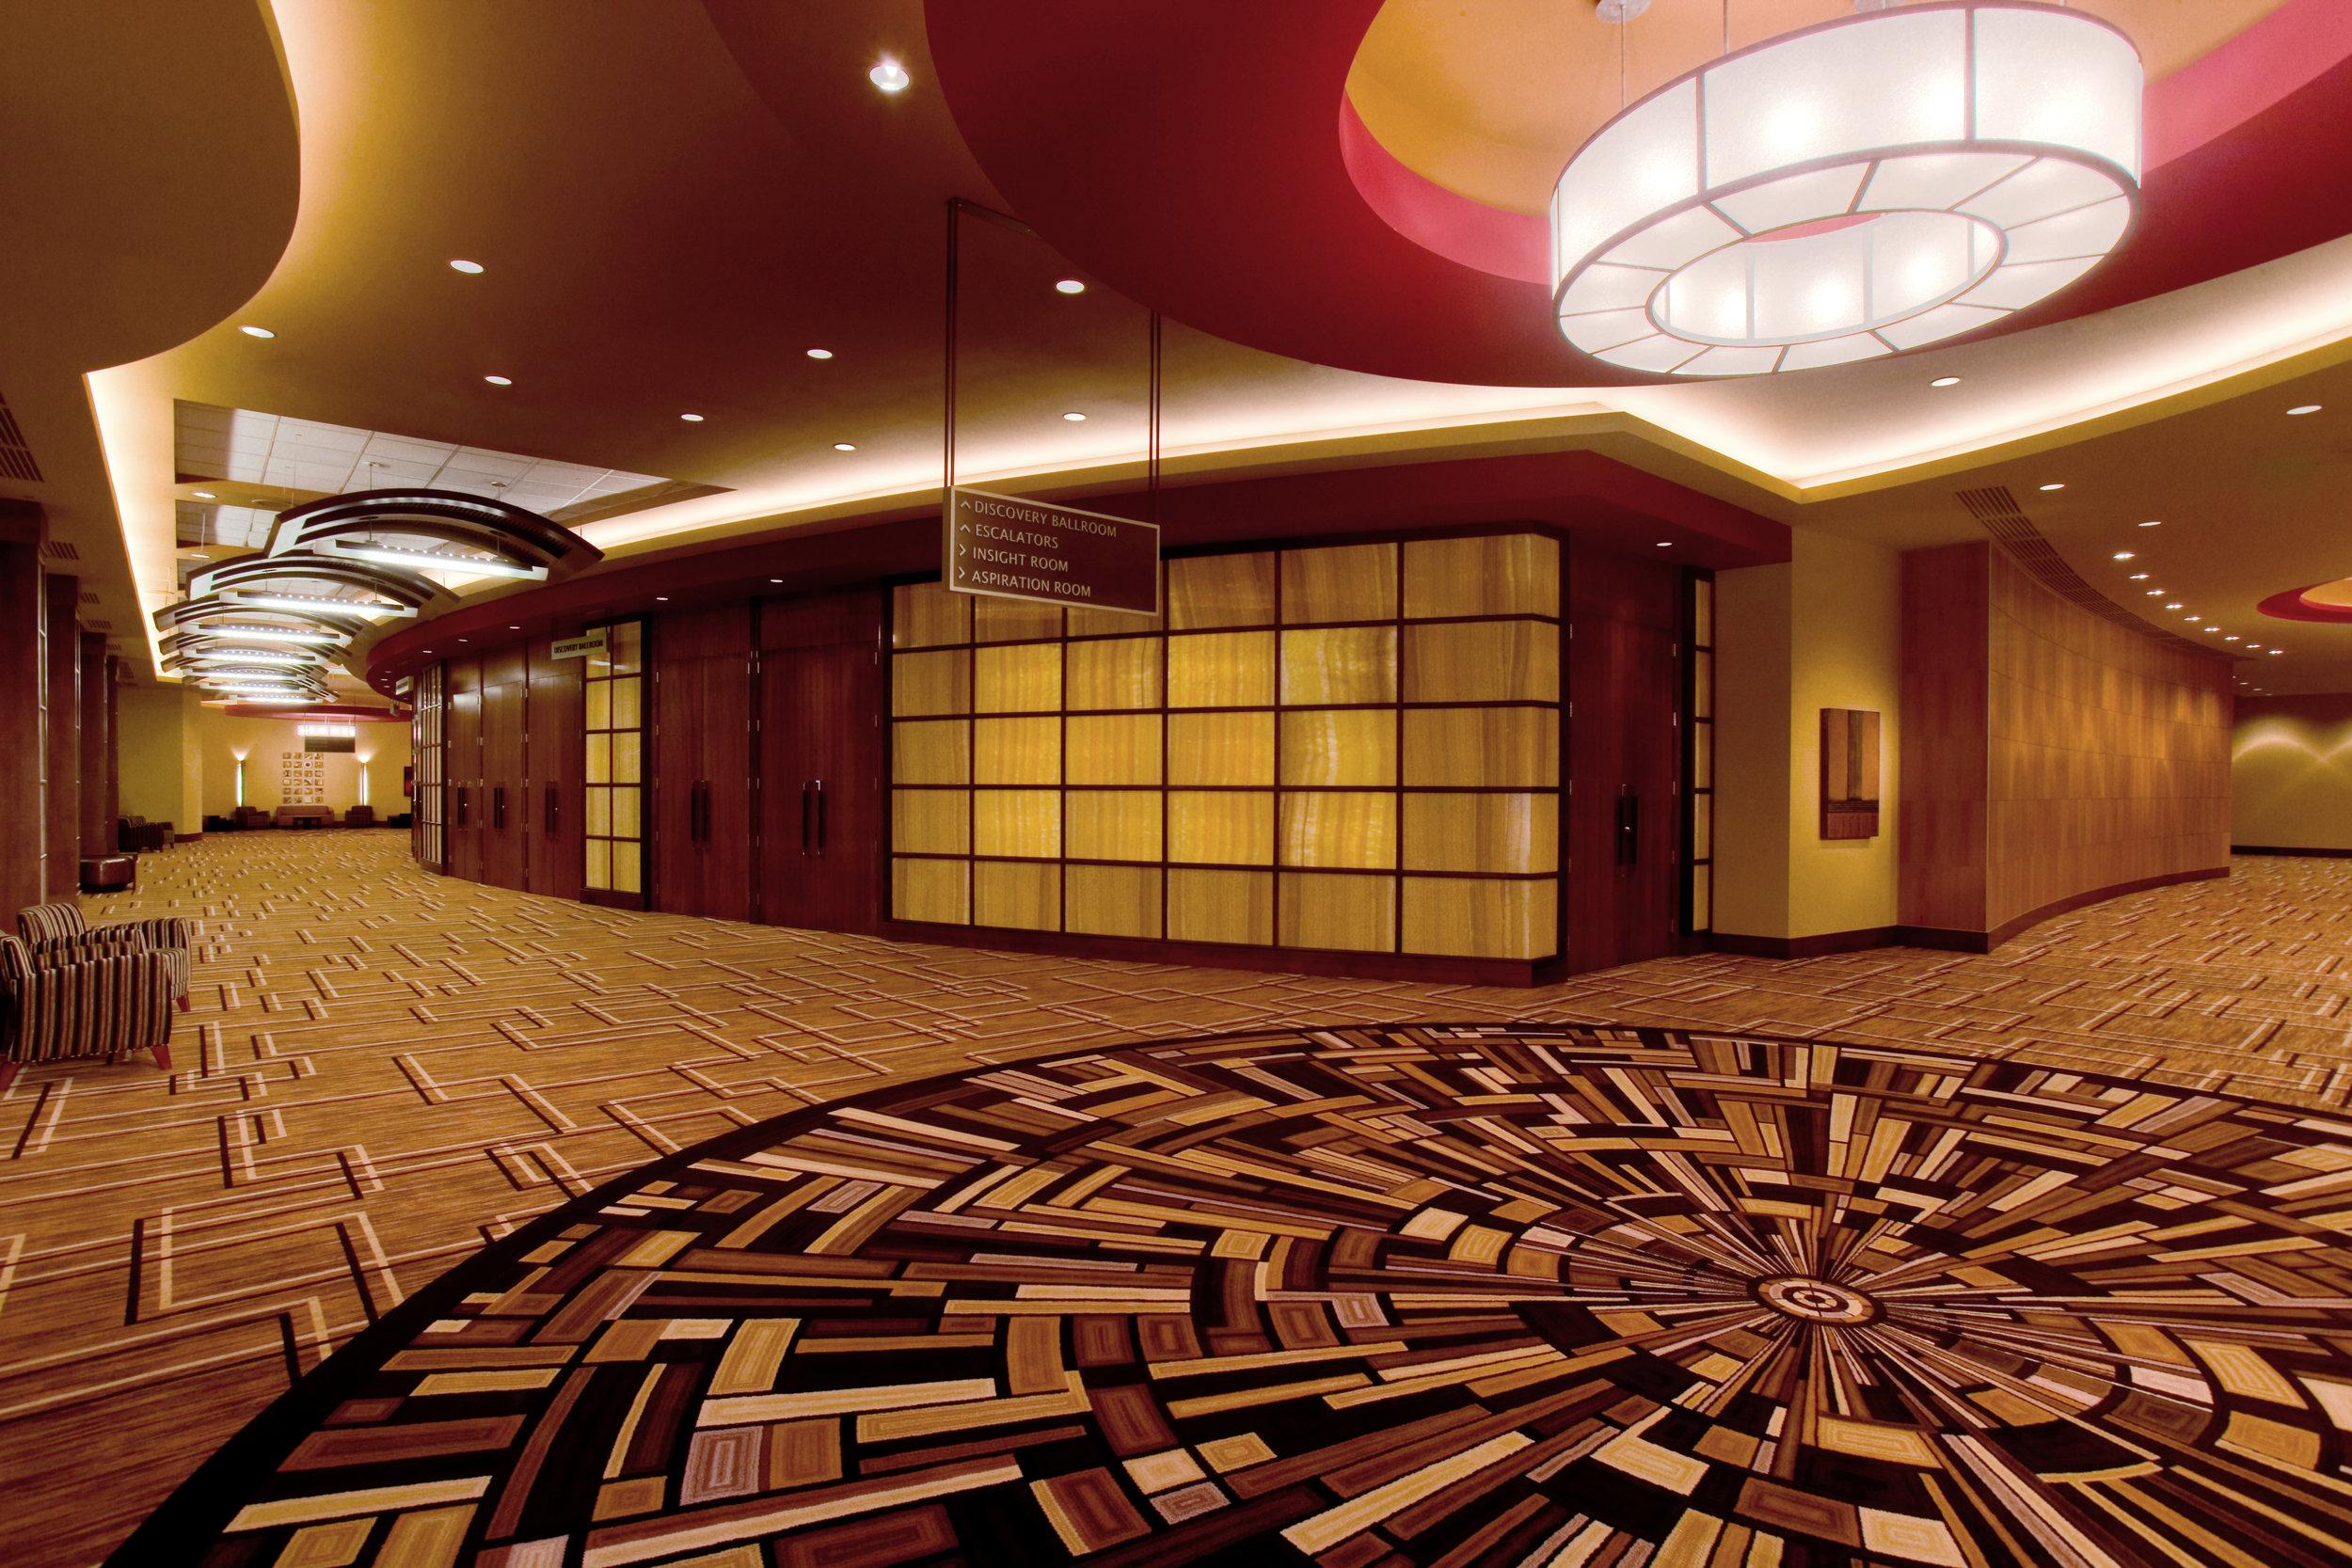 ameristar sc conference center - 01.jpg